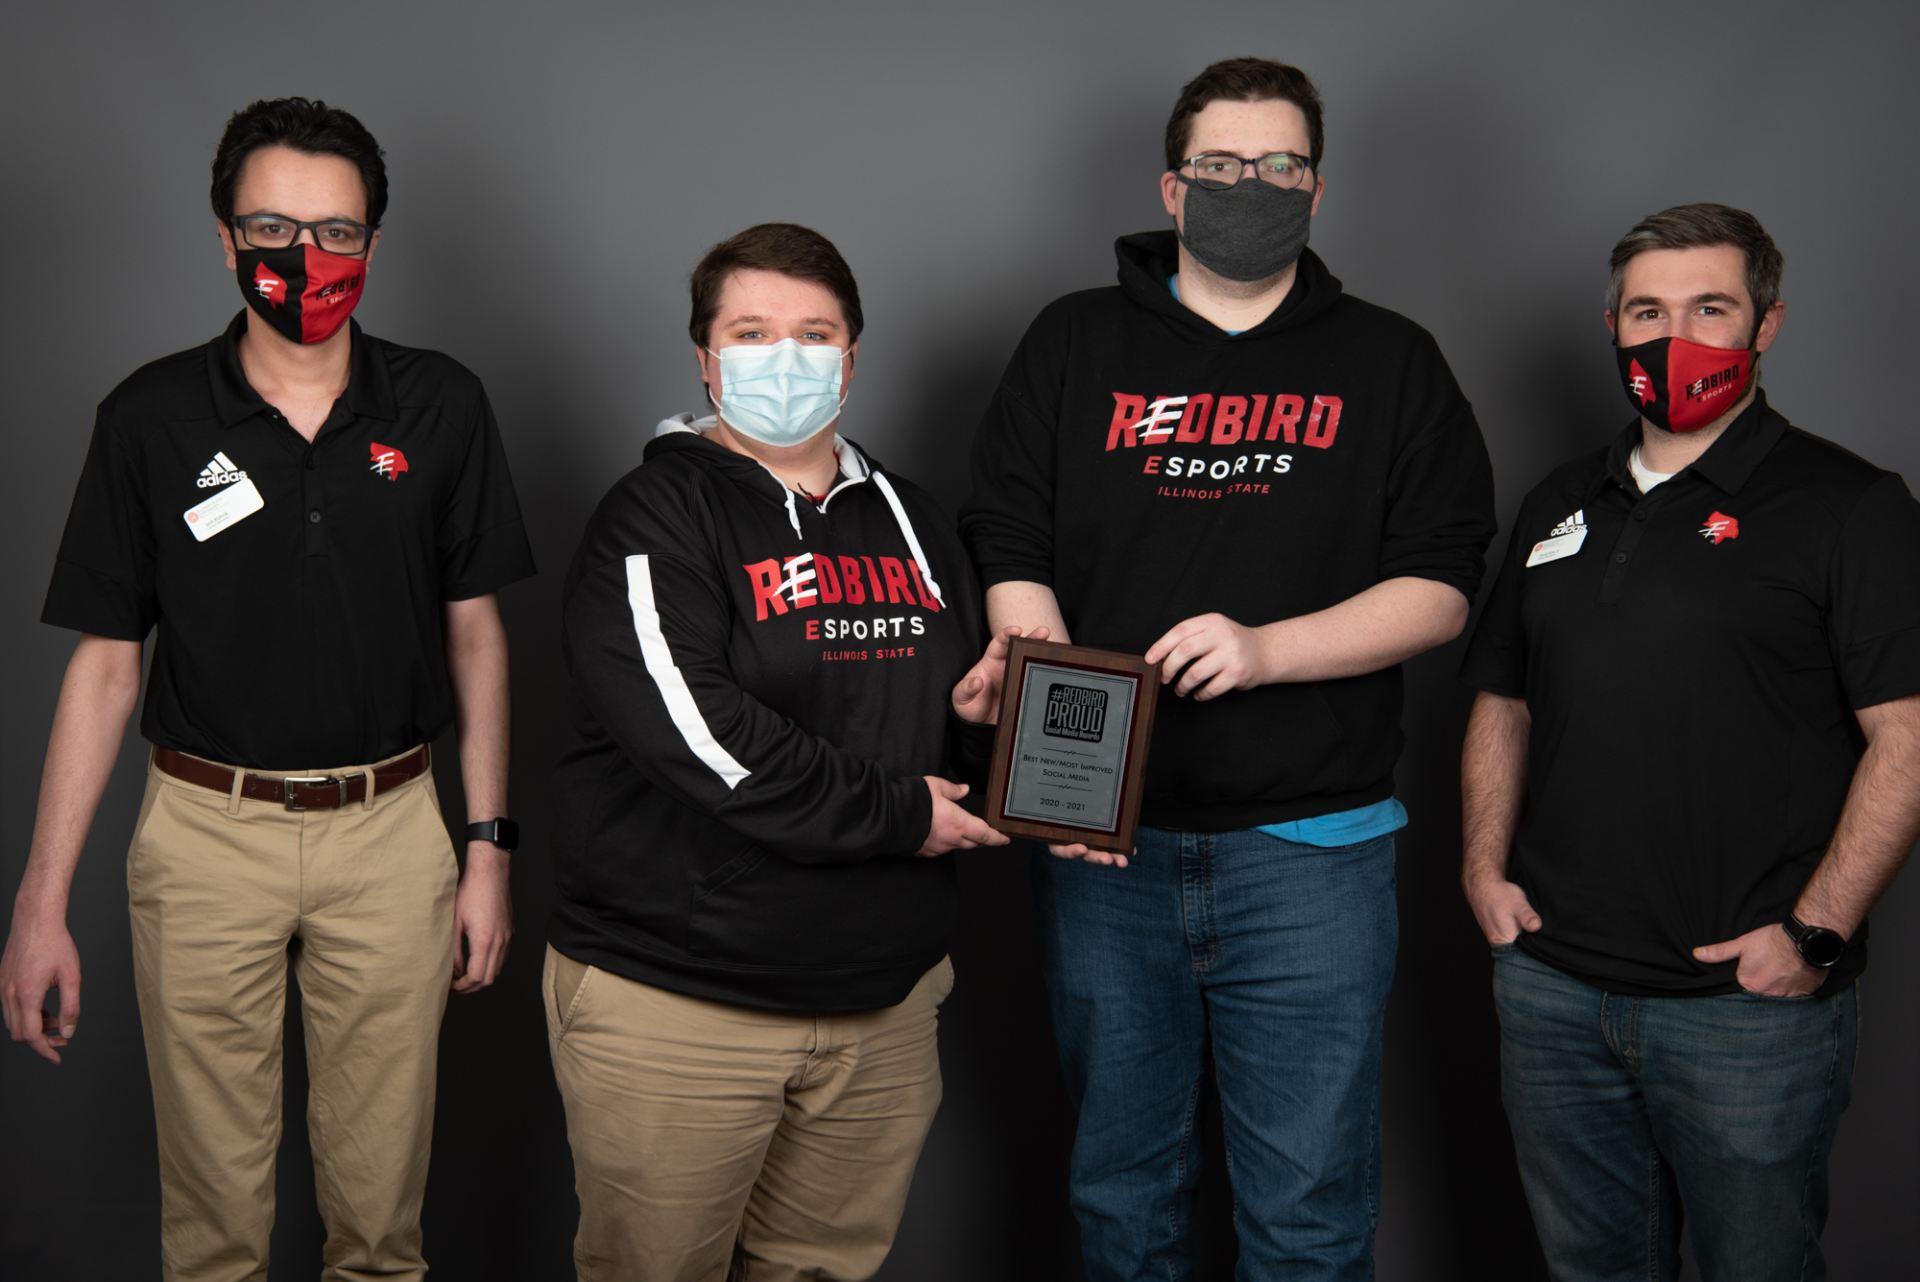 Redbird Esports posed with award